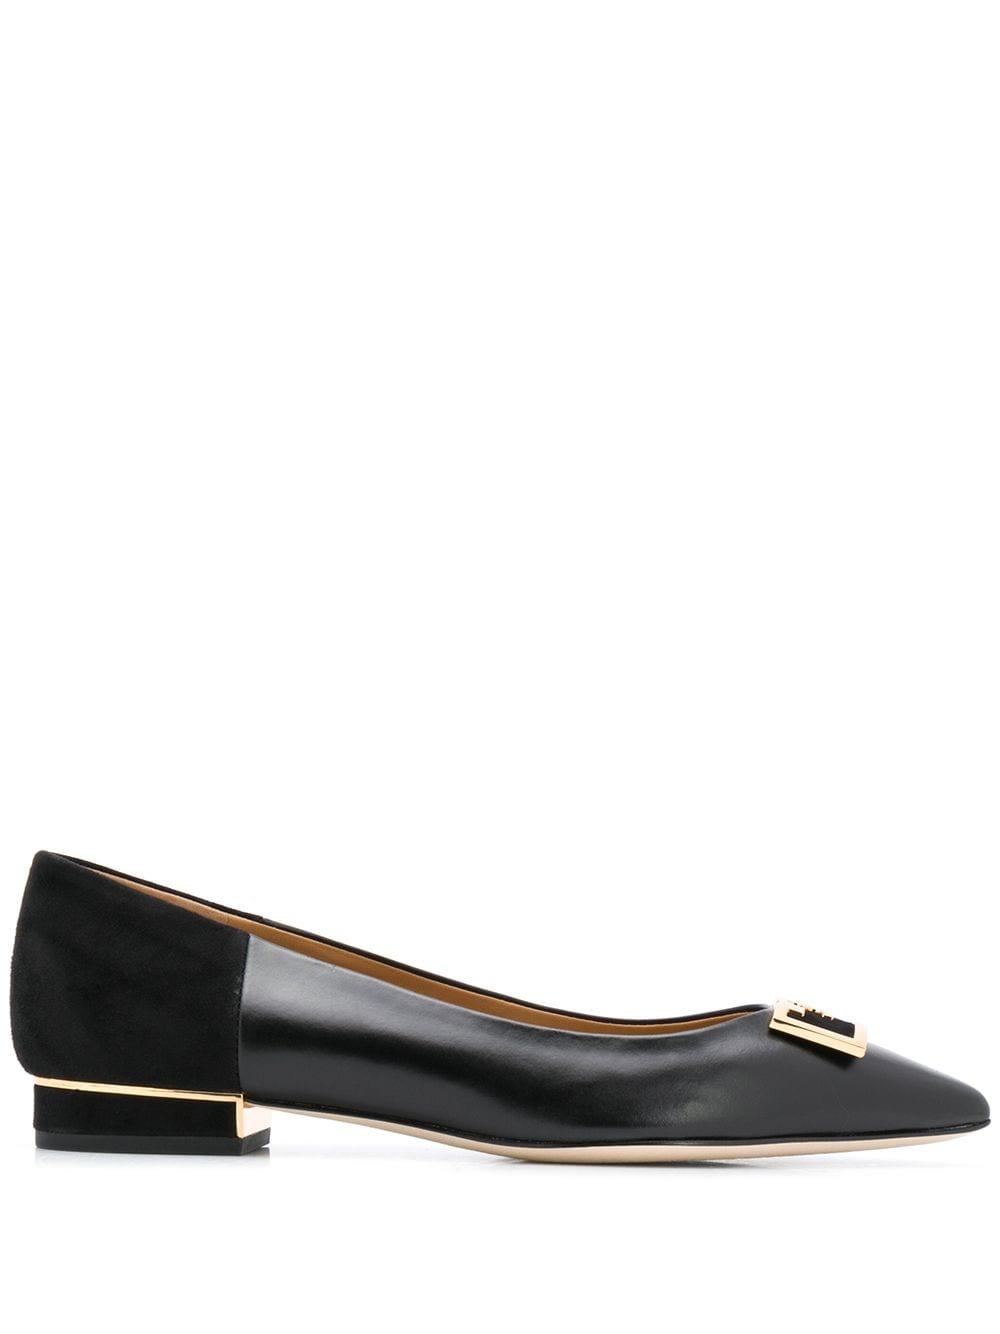 Gigi Leather Ballets